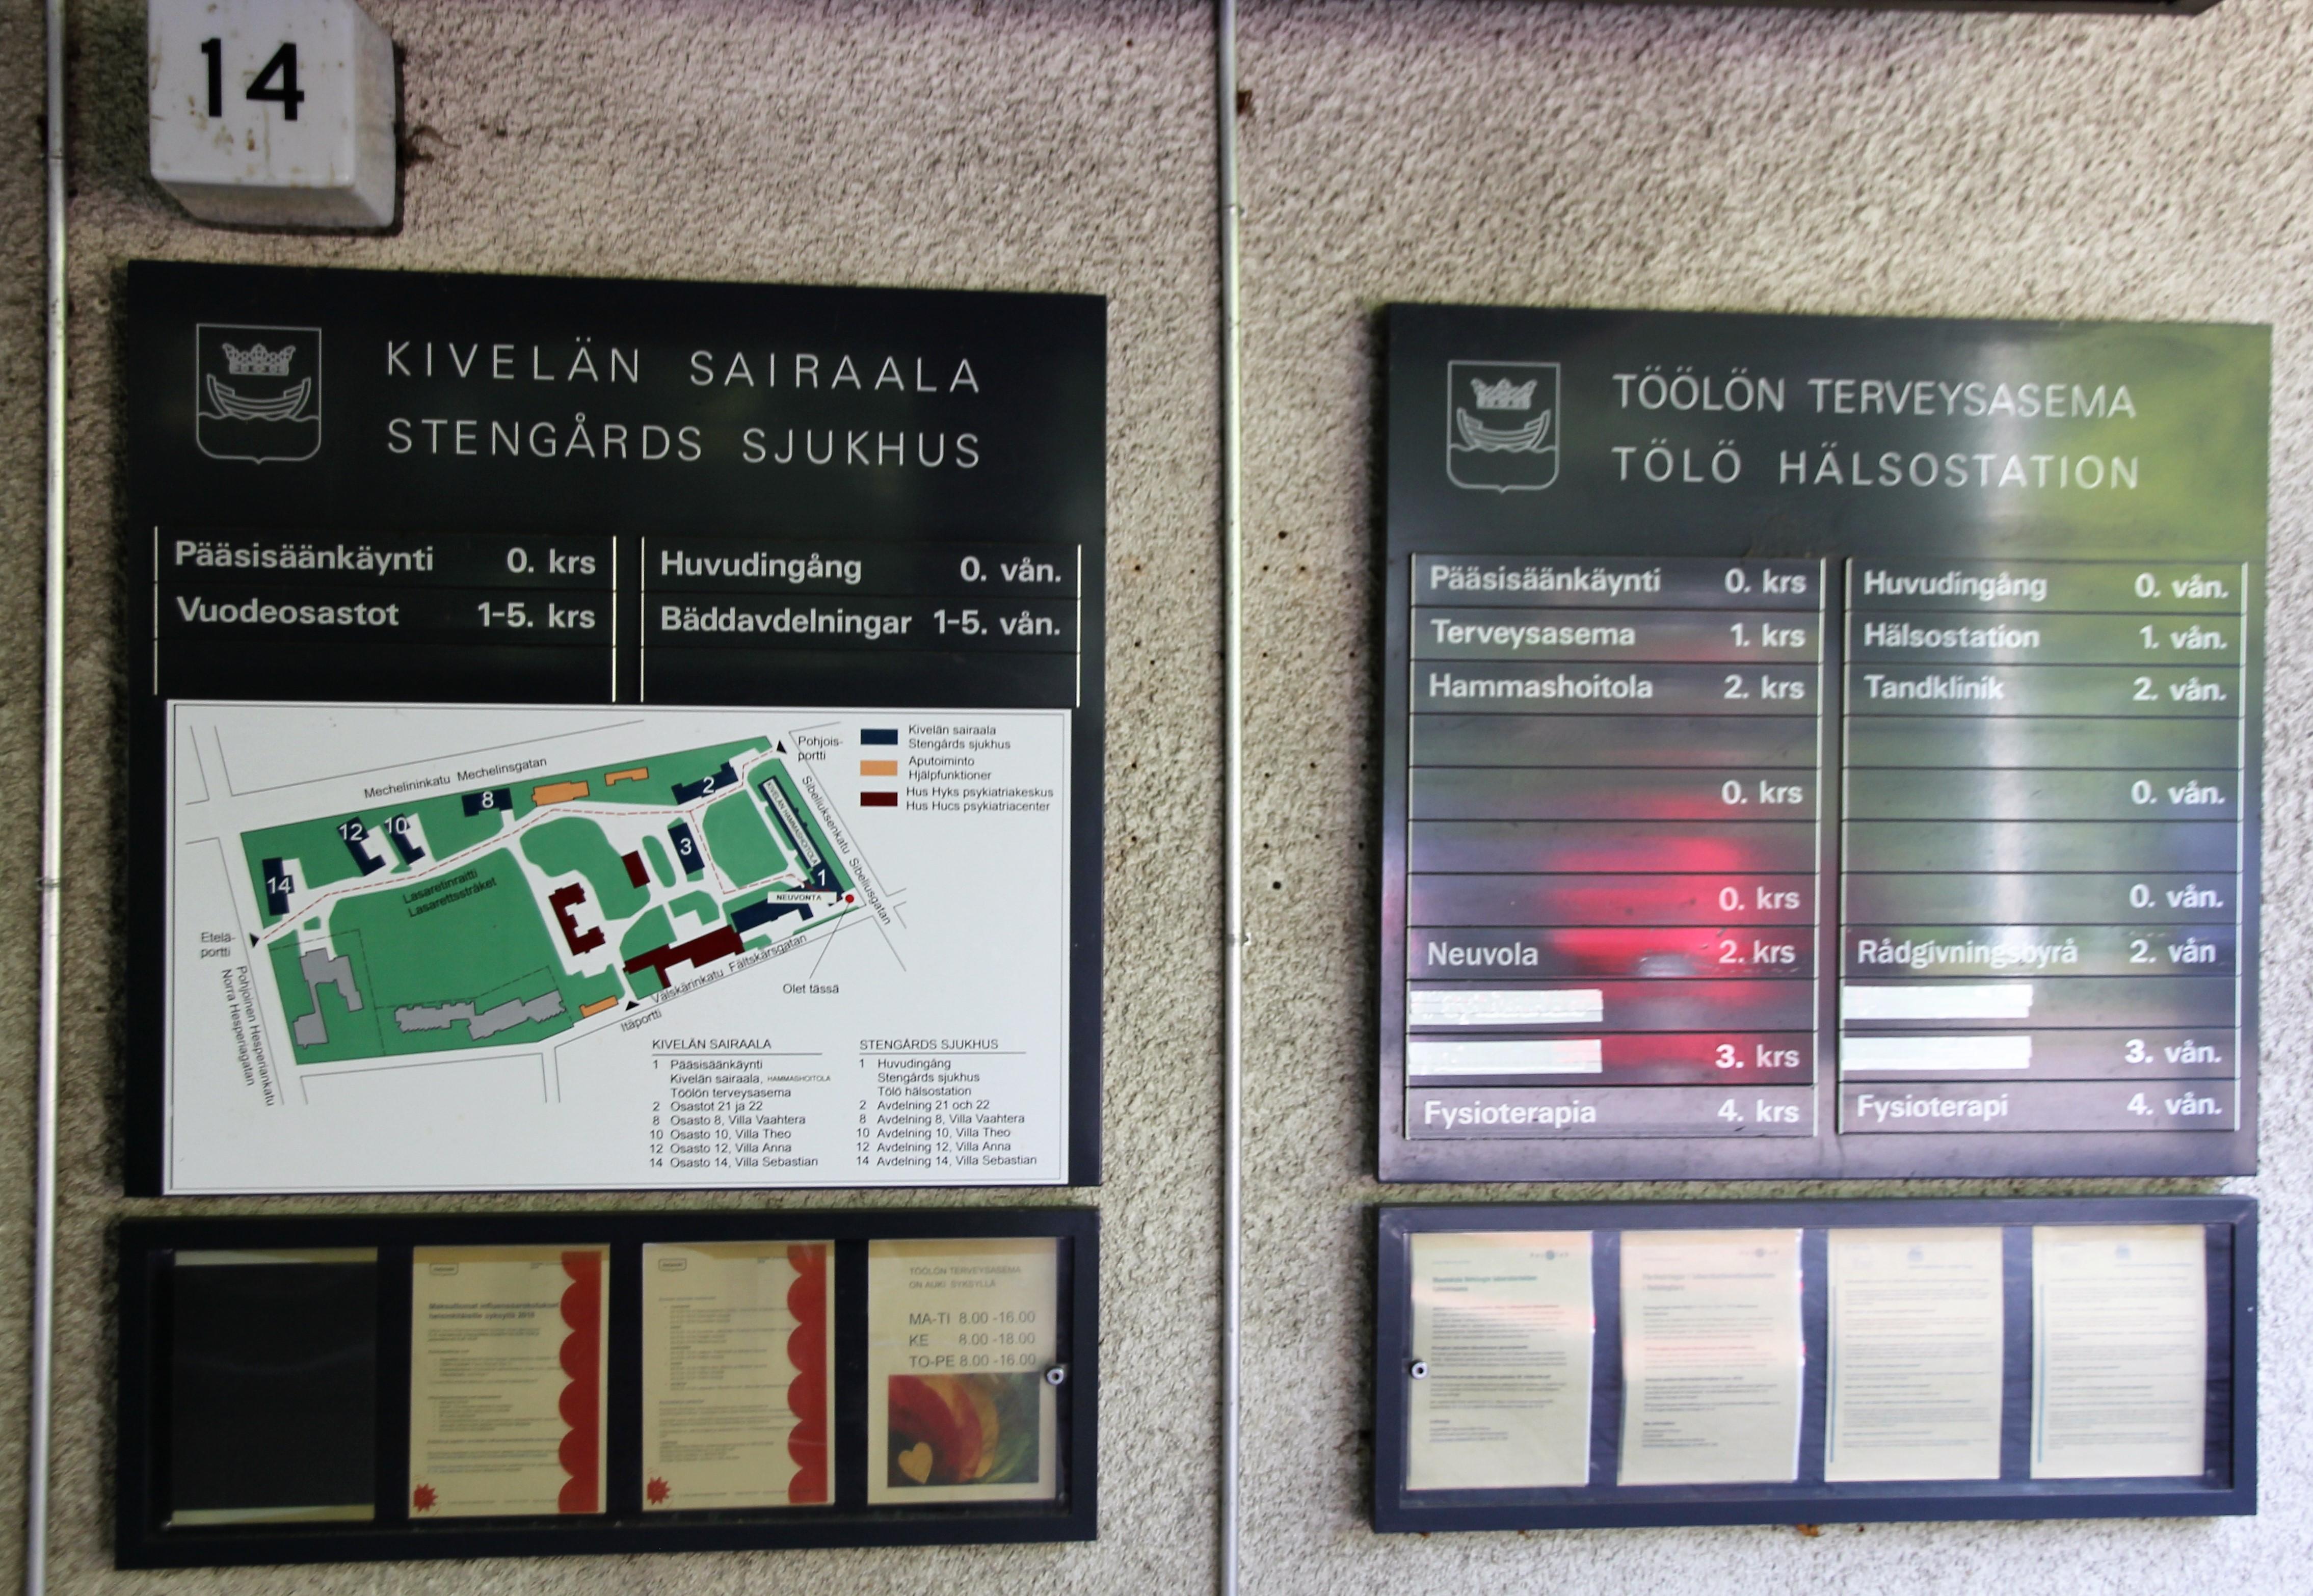 File Kivelan Sairaala Ja Toolon Terveysasema Helsinki 3 Jpg